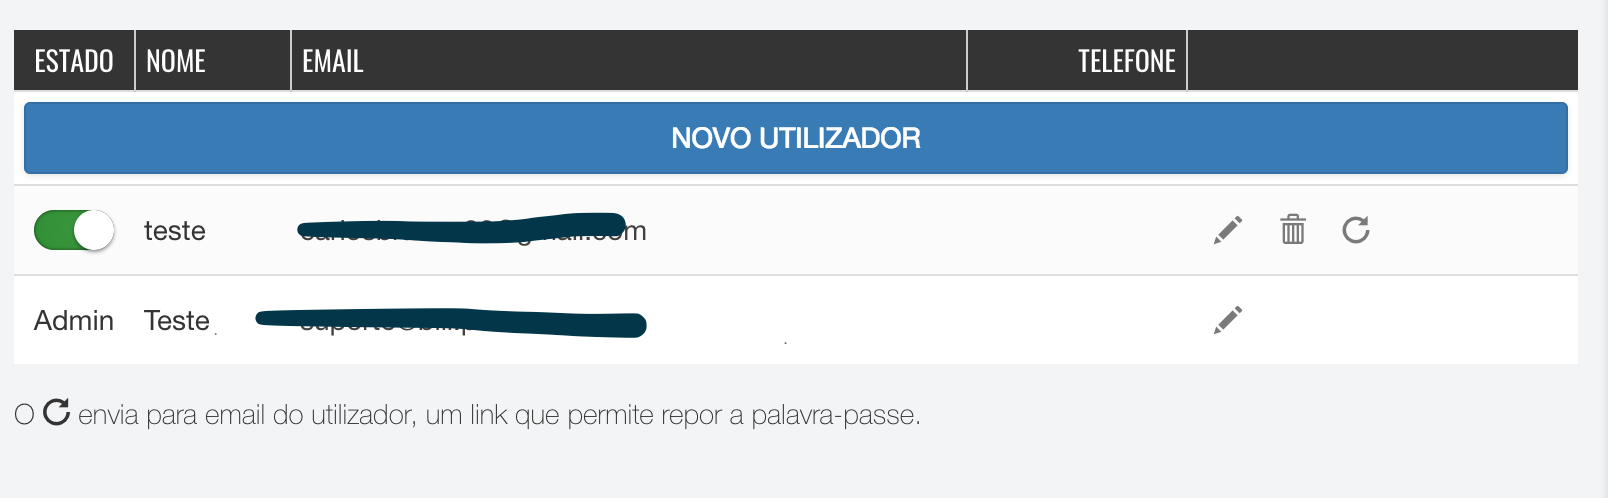 adicionar e remover utilizadores